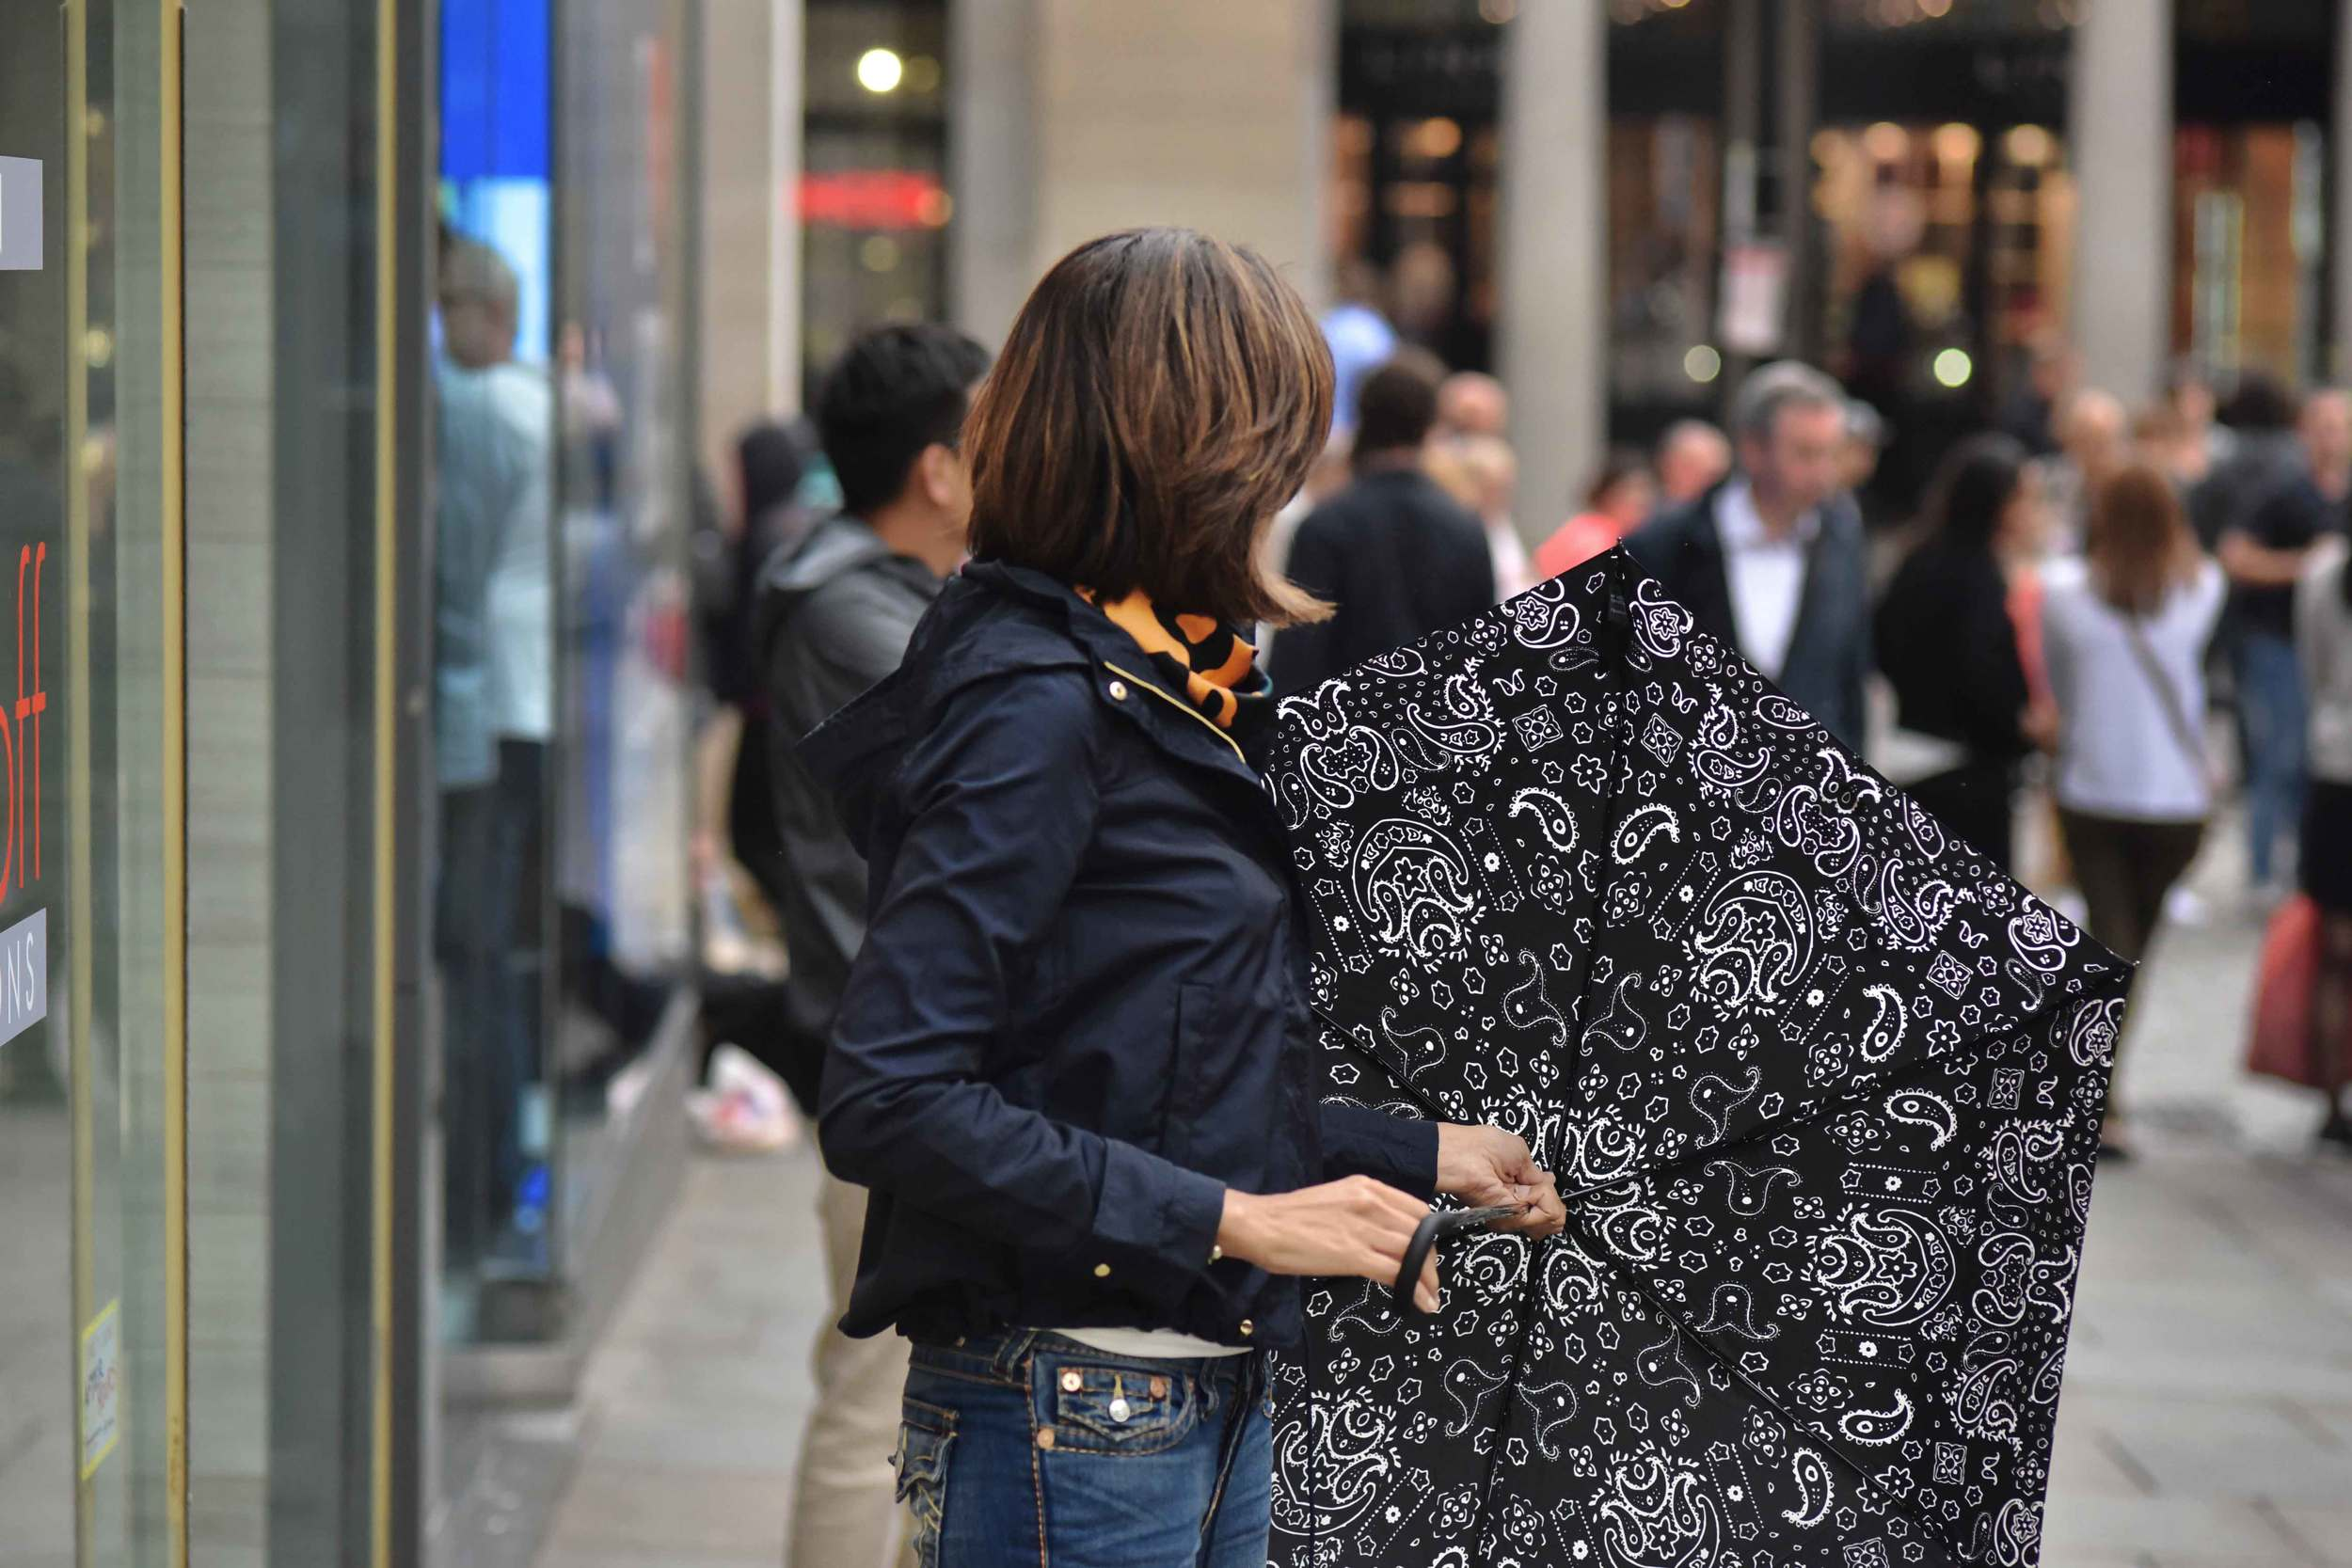 Zara water repellent jacket, Zara printed pocket square, Zara bandana print umbrella, True Religion jeans, Covent Garden, London, UK. Image©sourcingstyle.com